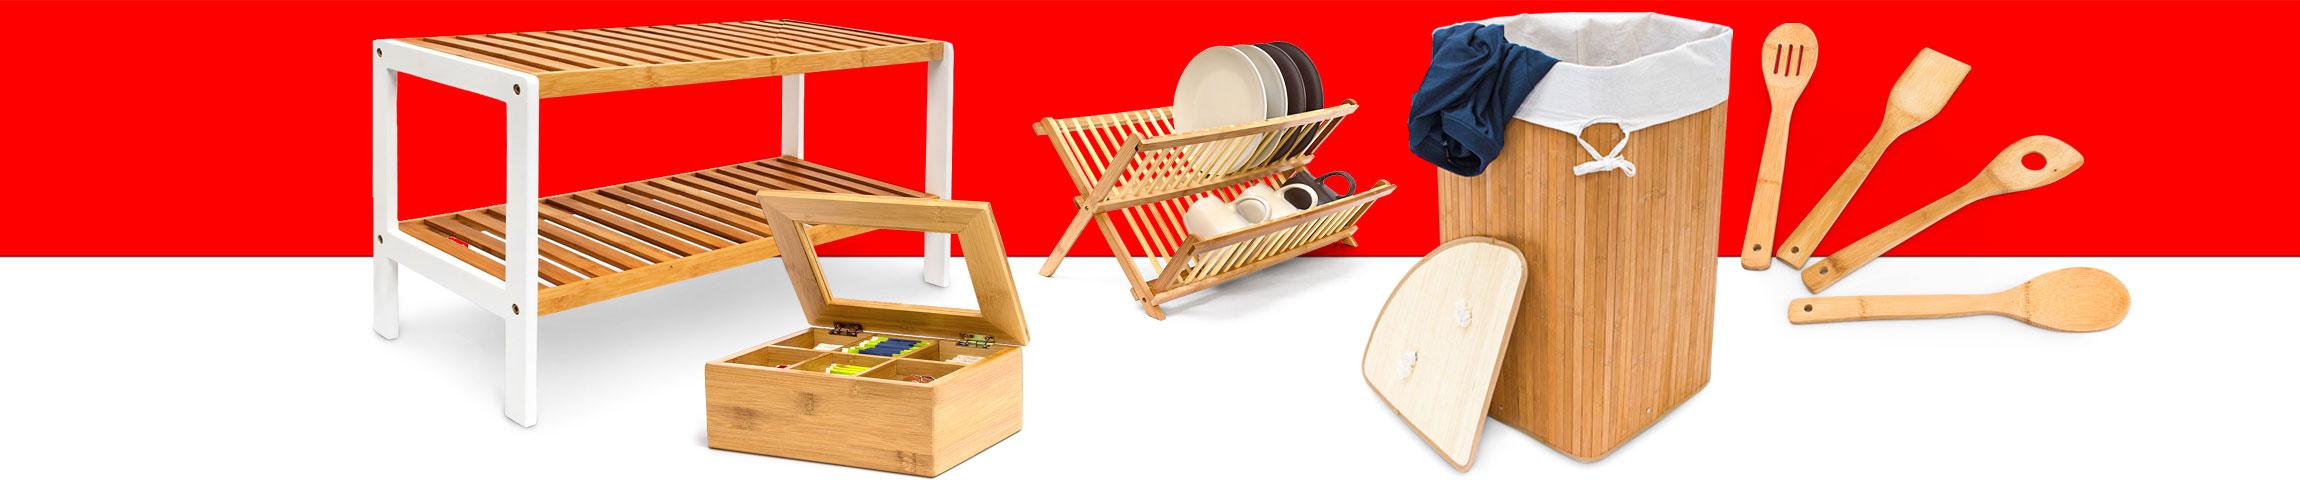 Sachen aus Bambus